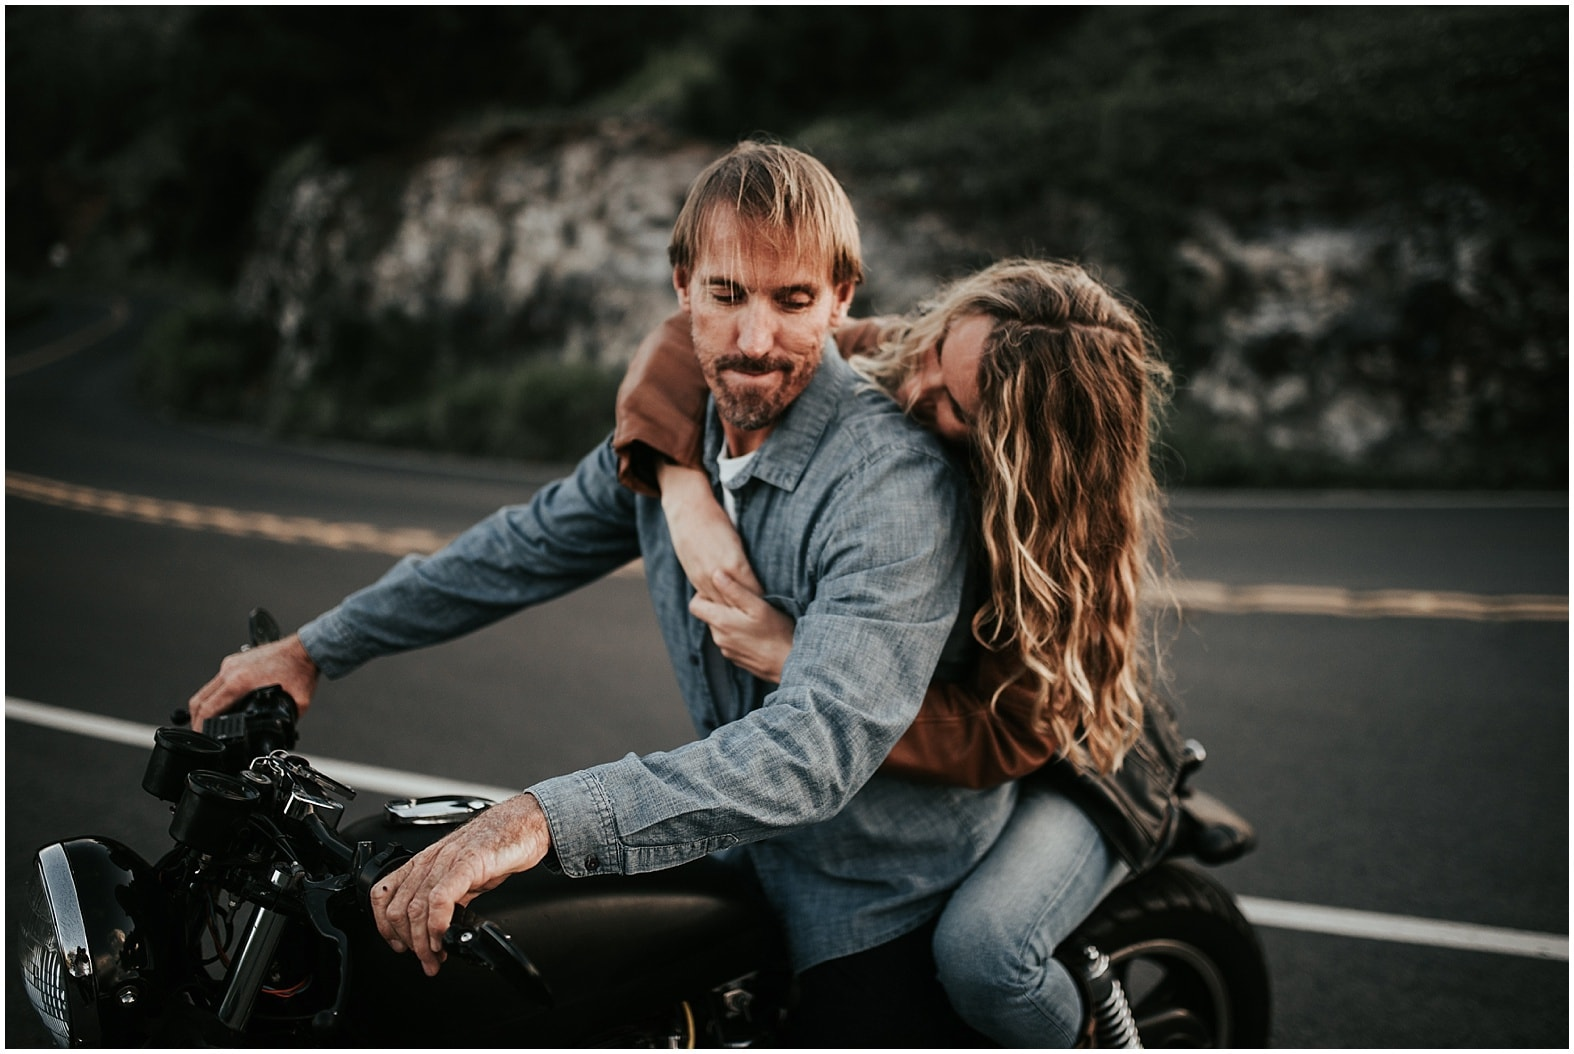 Motorcycle maui5